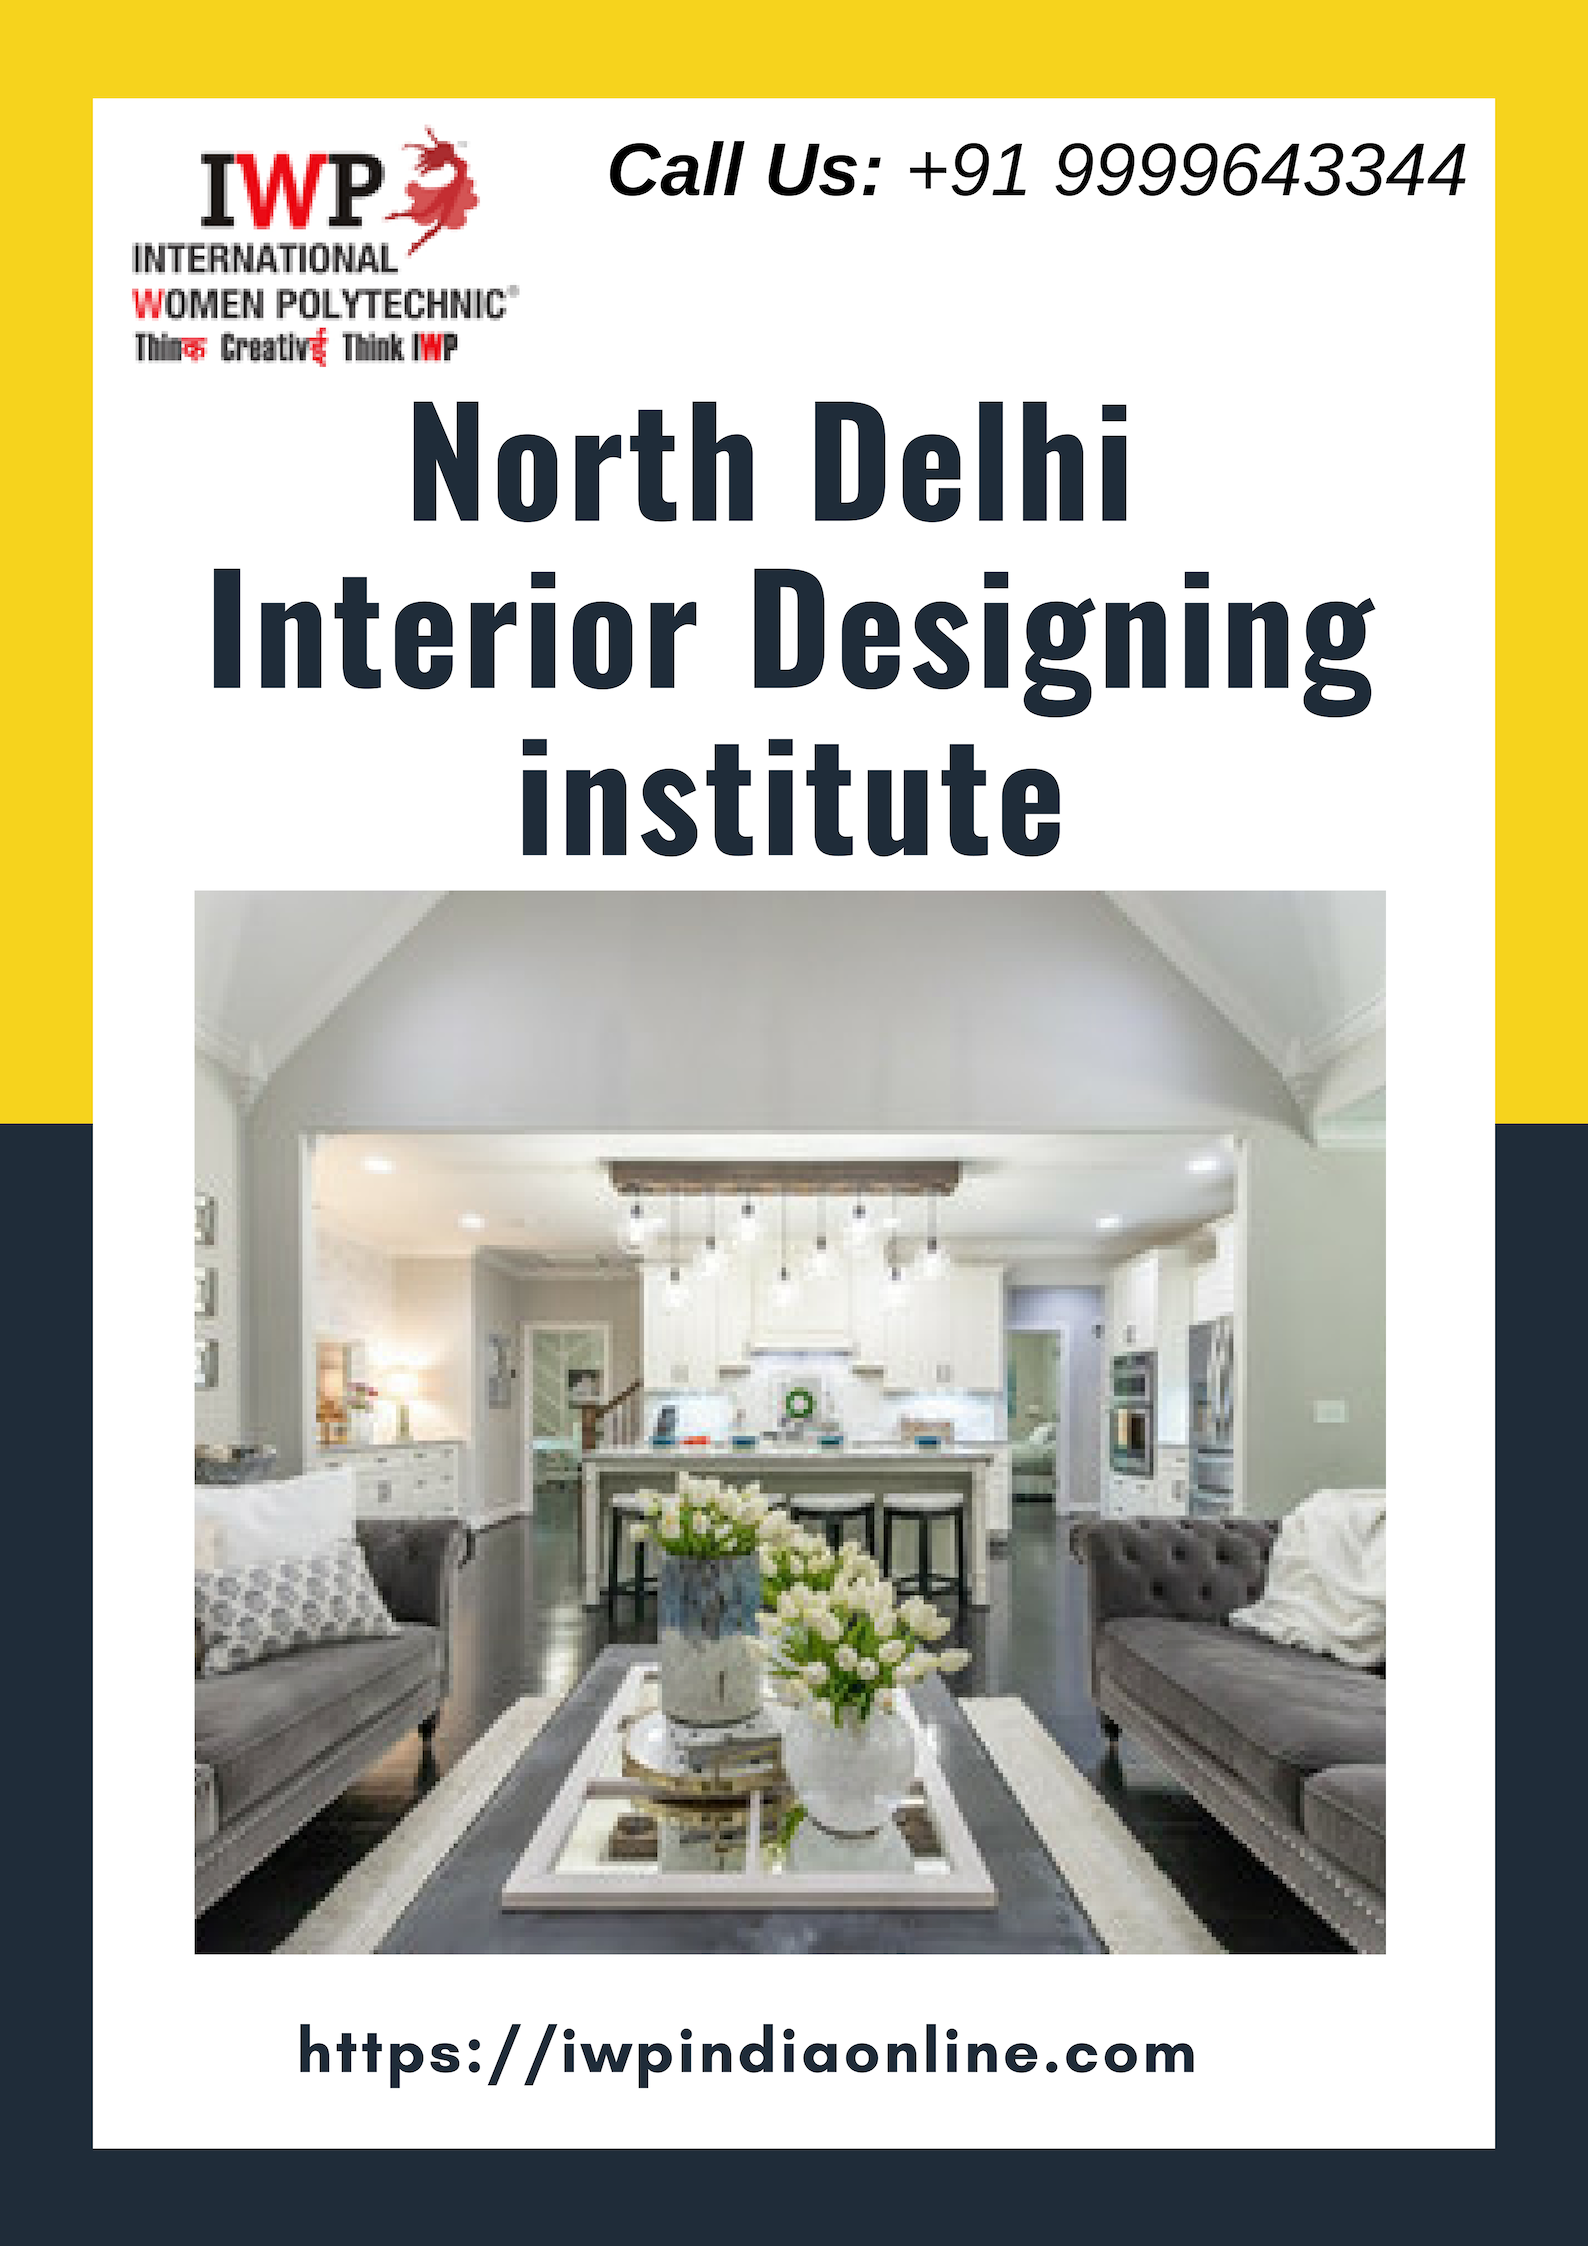 Pin By Maya Mathur On Iwp Institute North Delhi Model Town Interior Design Courses Interior Design Institute Interior Design